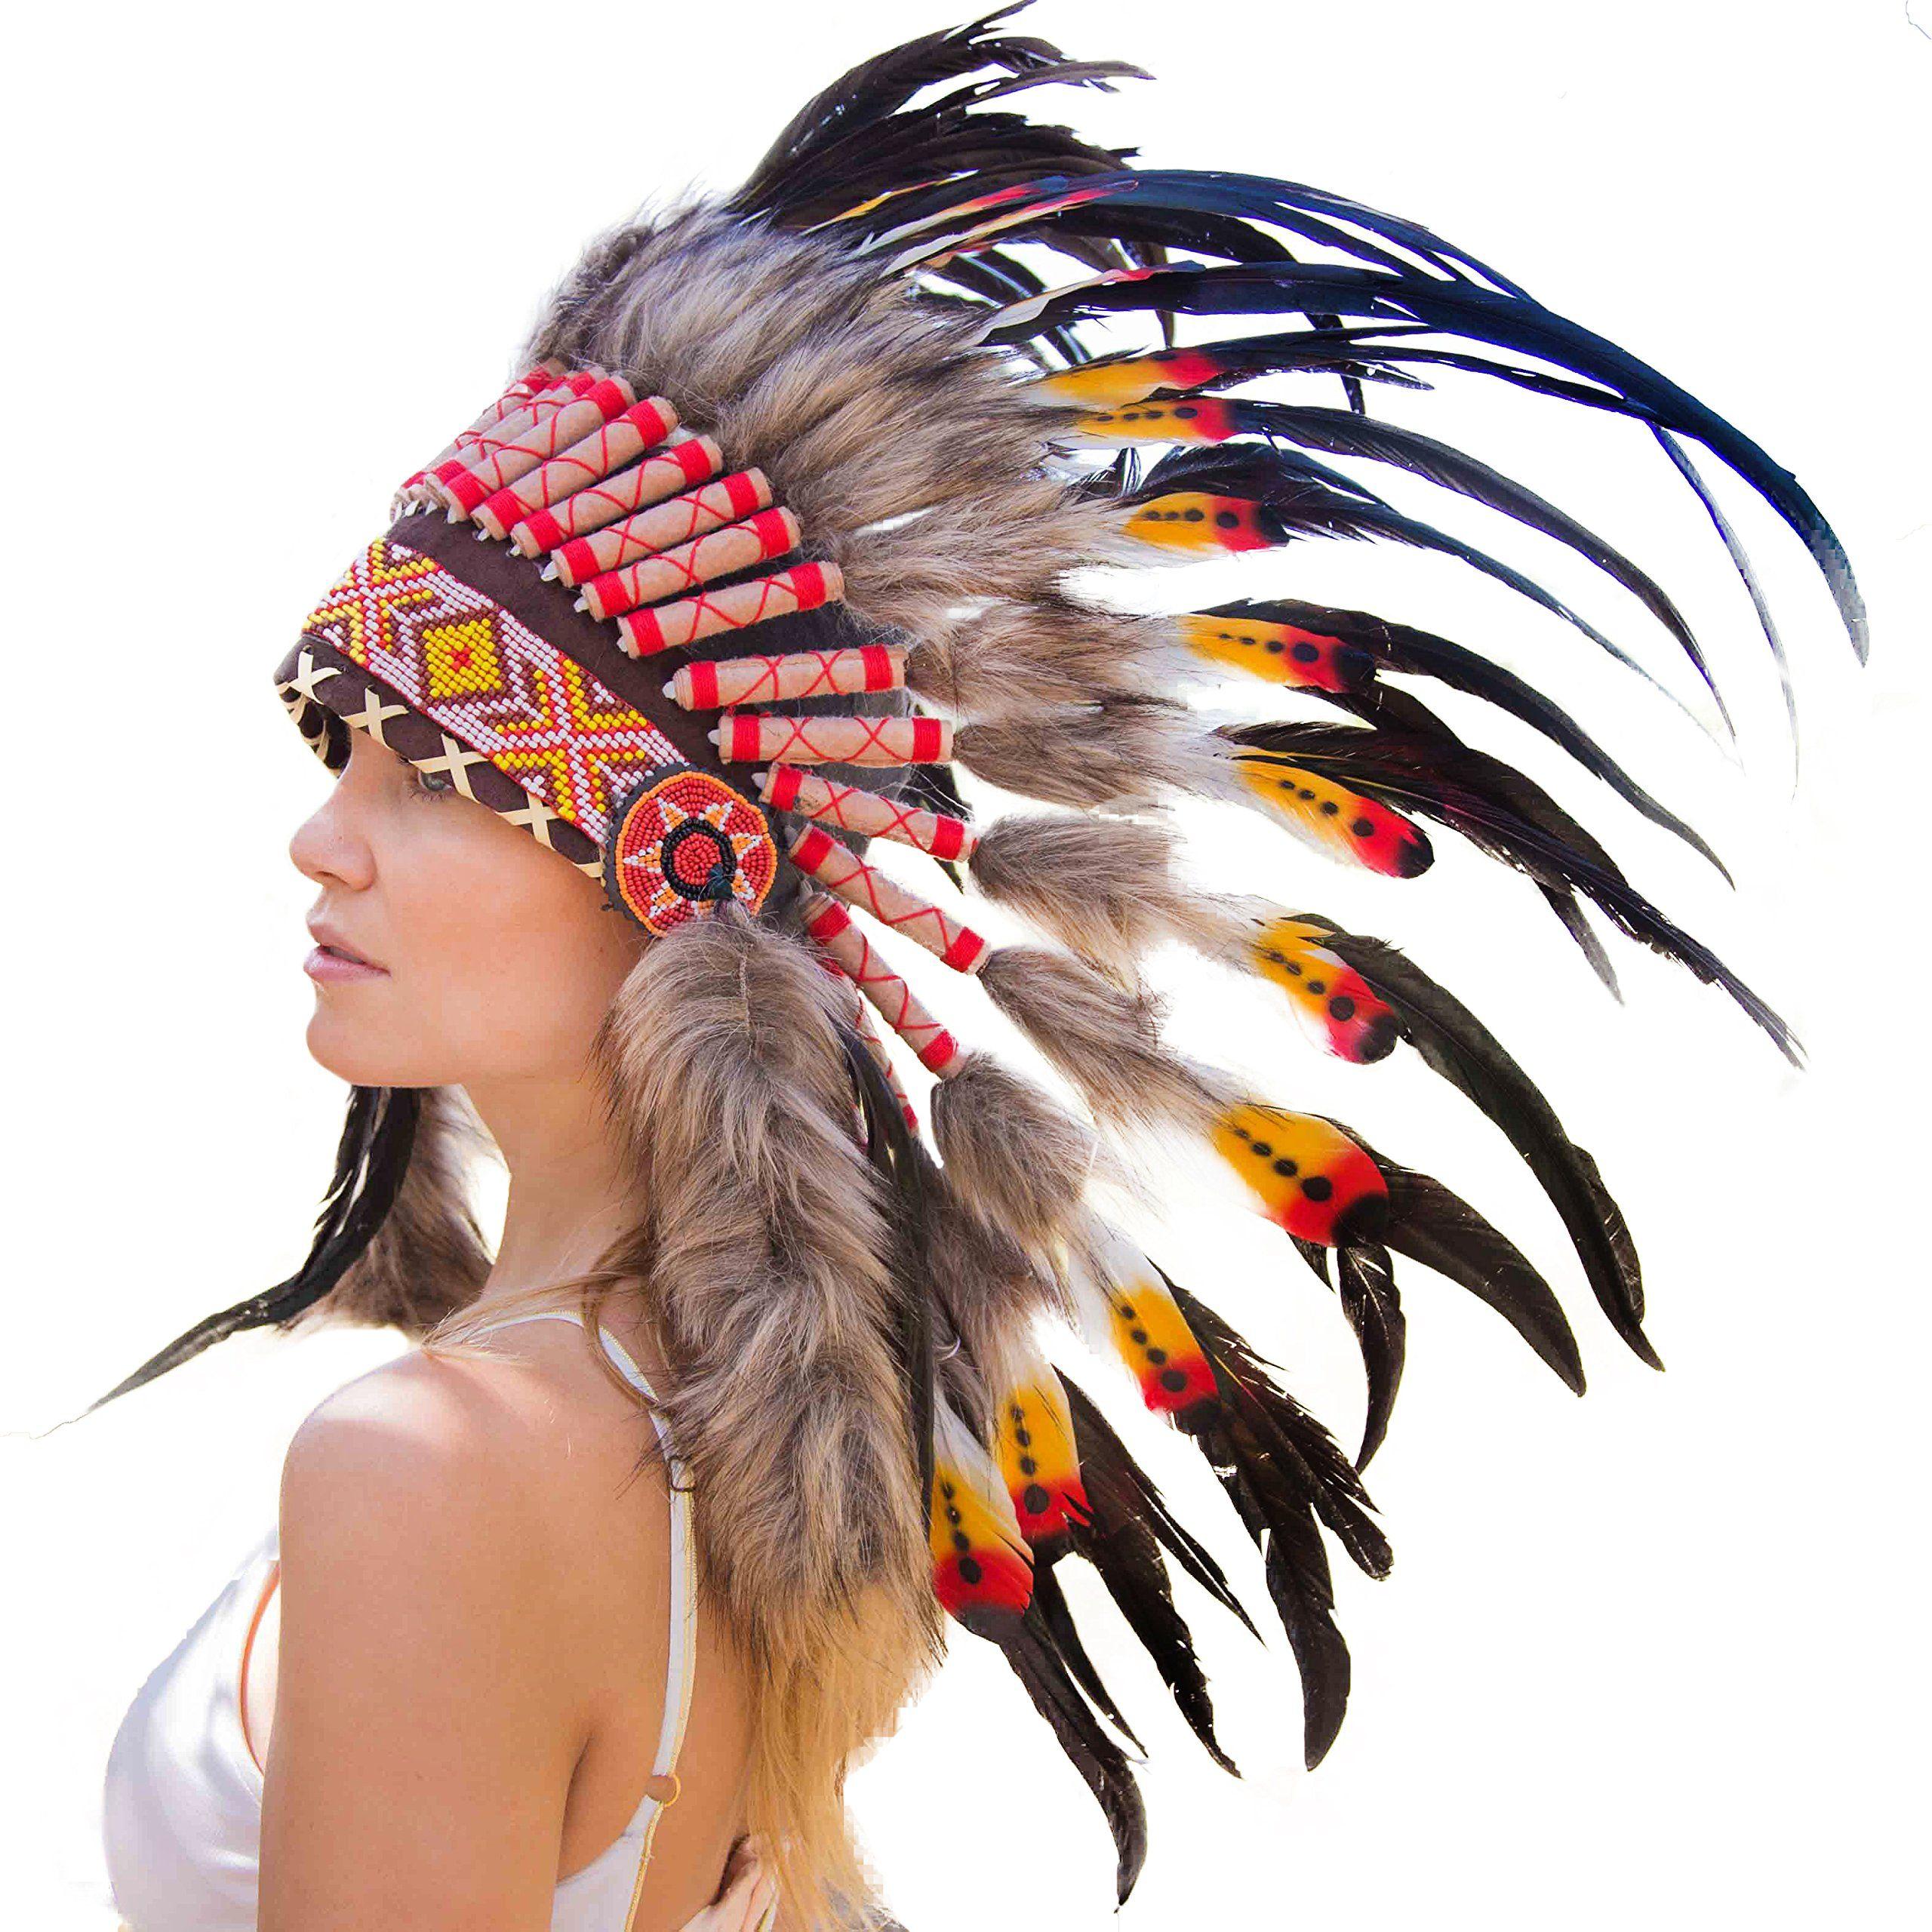 e90302cefb7f8 Indian Headdress